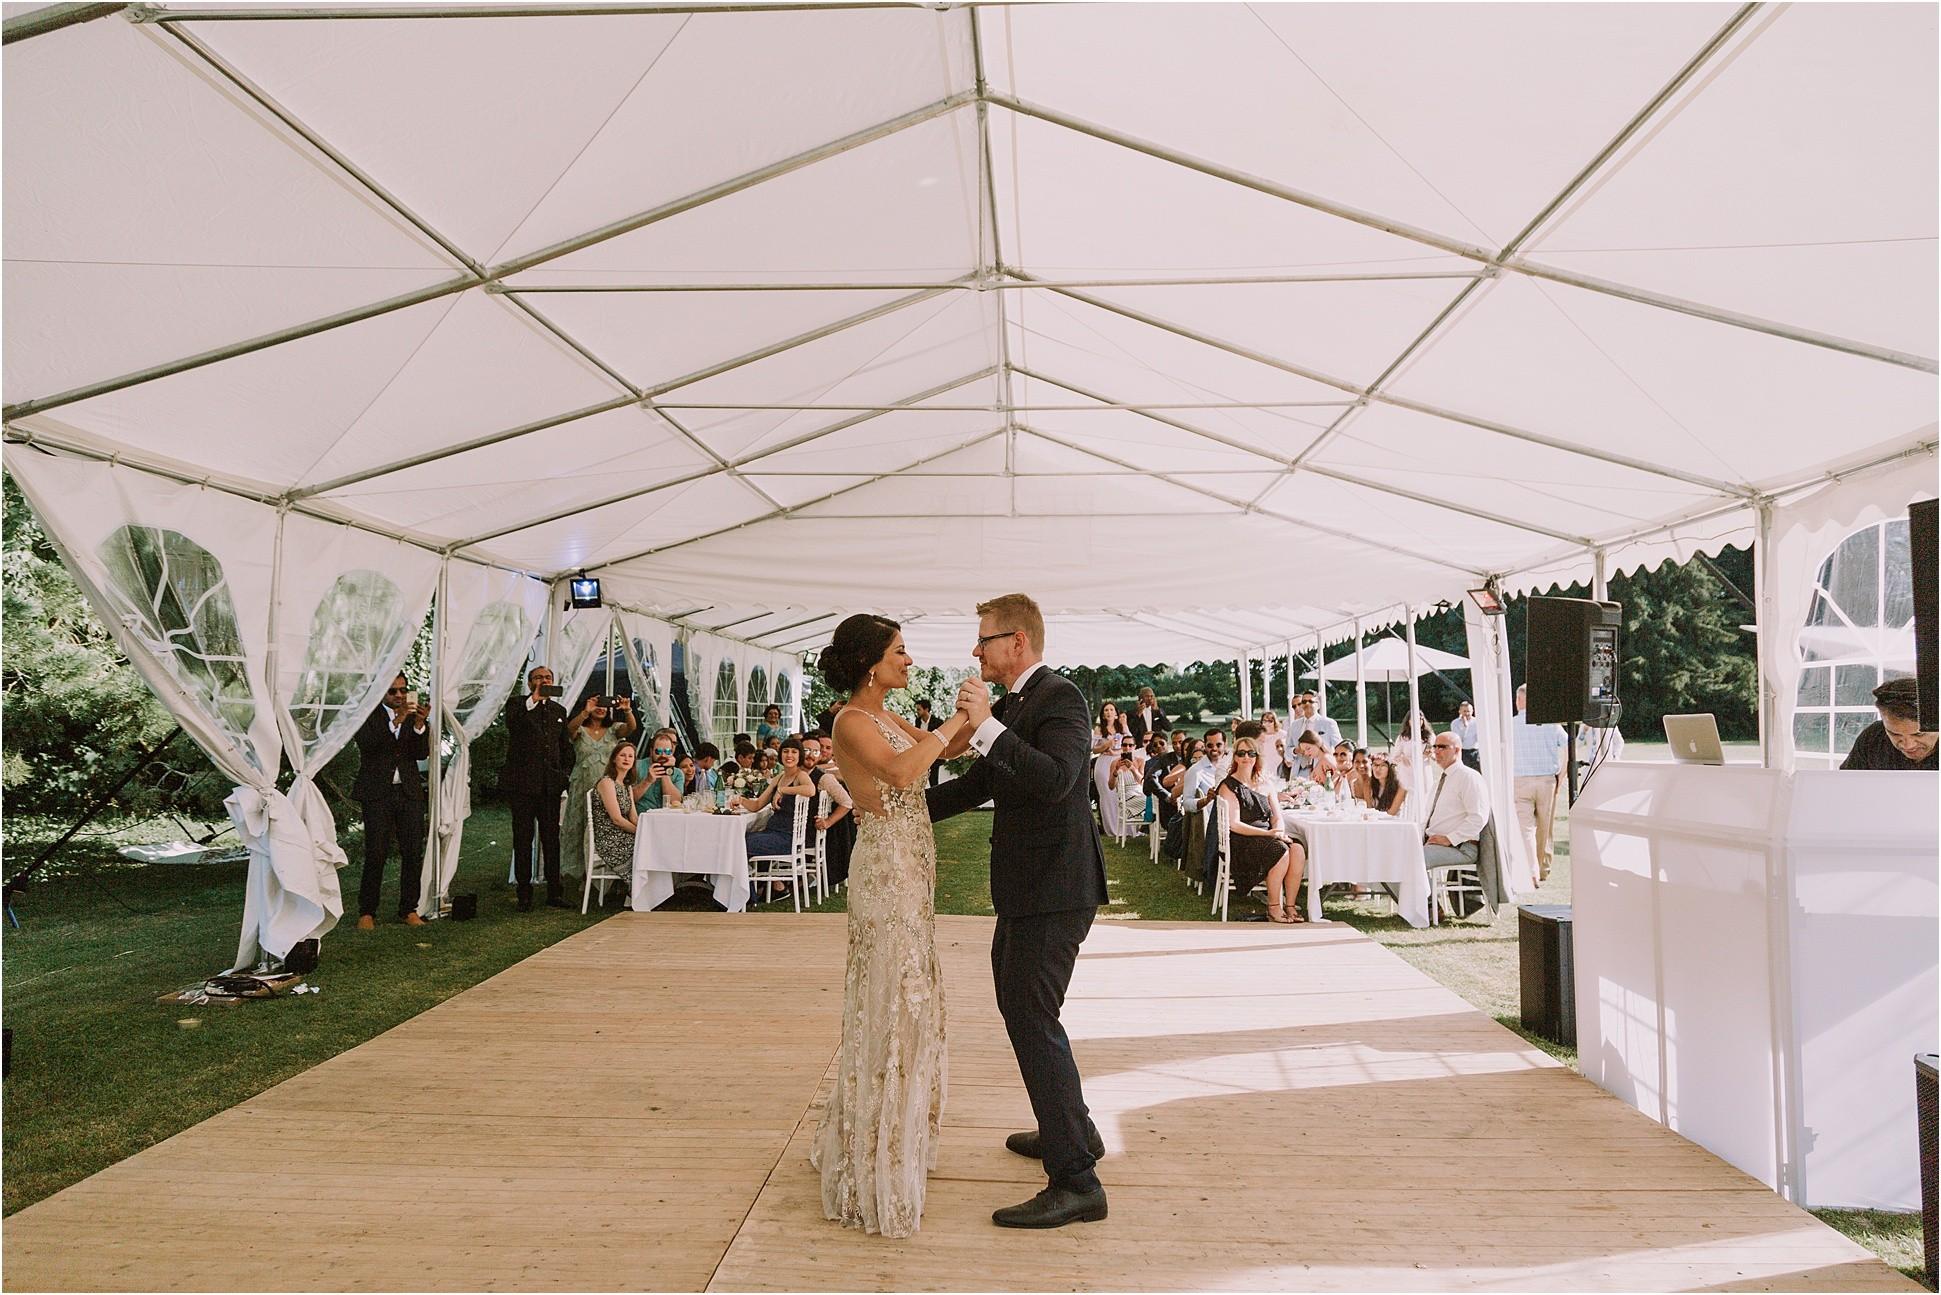 Kateryna-photos-photographe-mariage-chateau-st-paterne-mayenne-normandie_0131.jpg